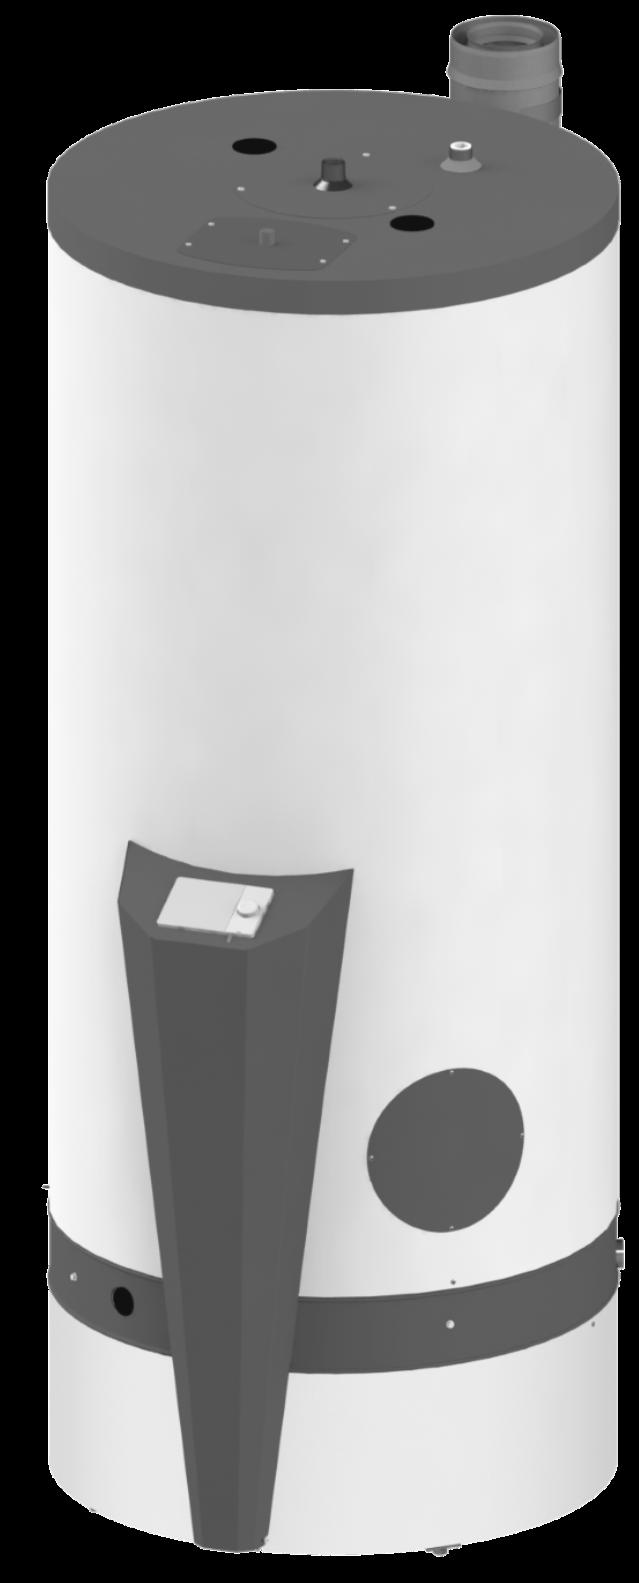 preparateur-deau-chaude-au-gaz-ridelgkd-ridel-energy